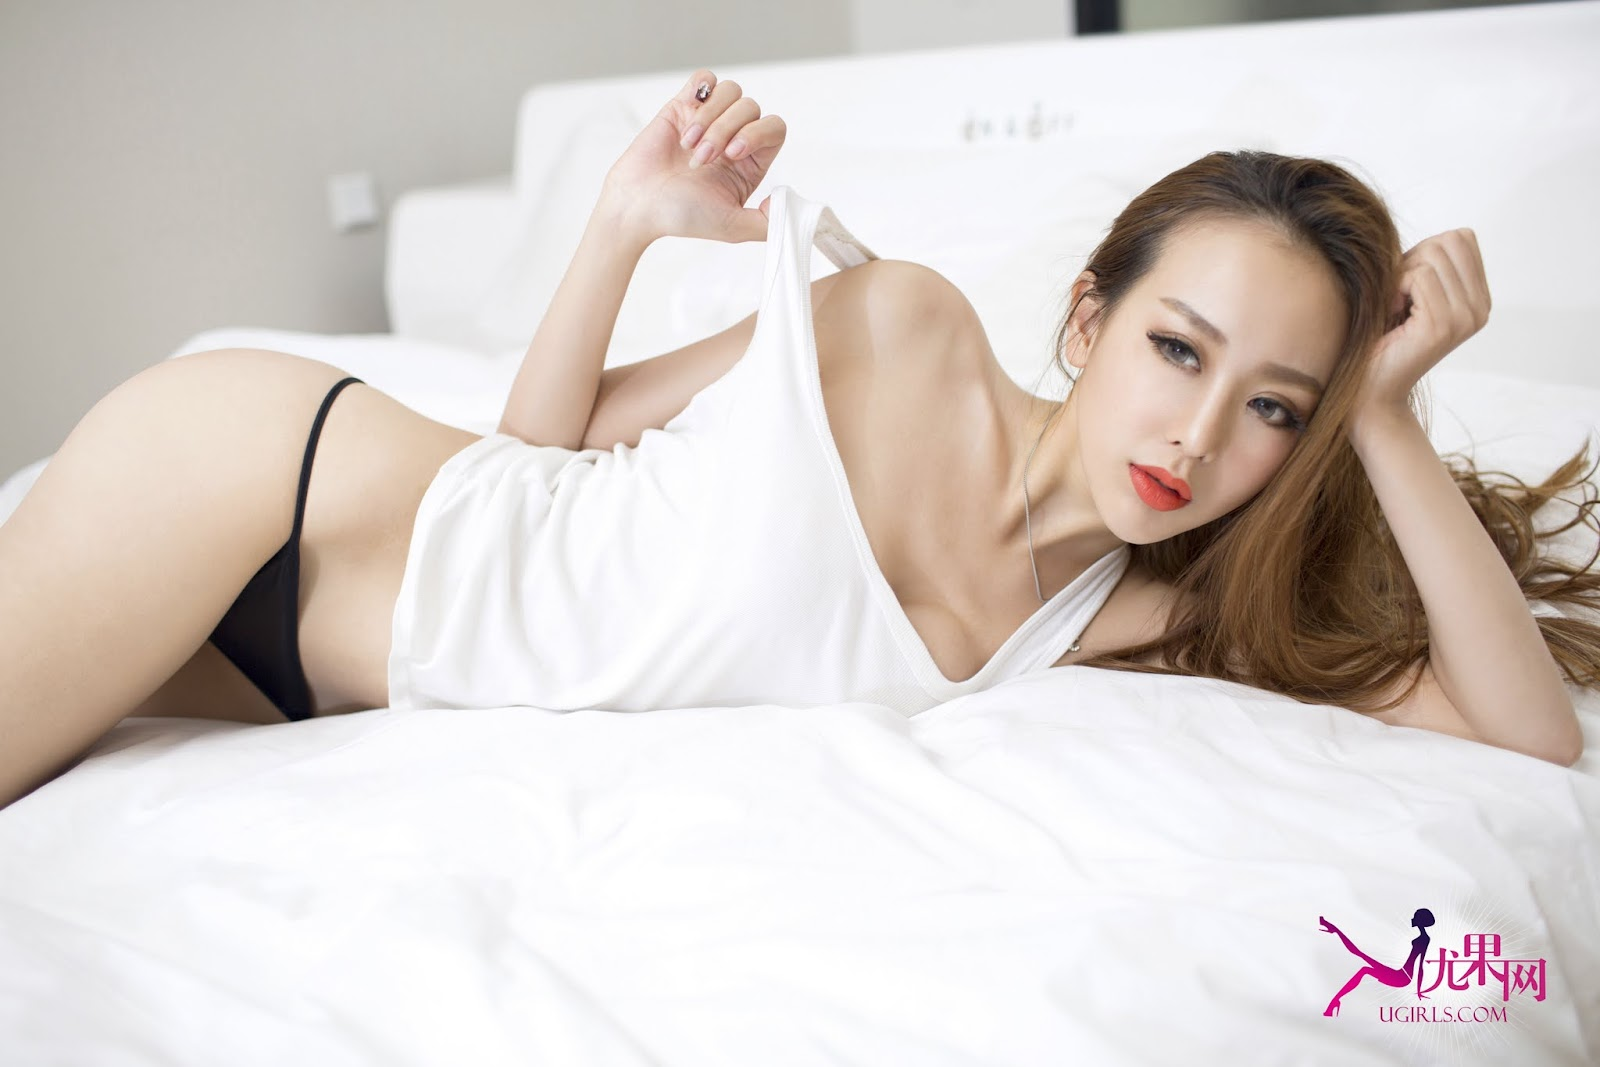 U091%2B%252849%2529 - Sexy Photo UGIRLS NO.91 Nude Girl